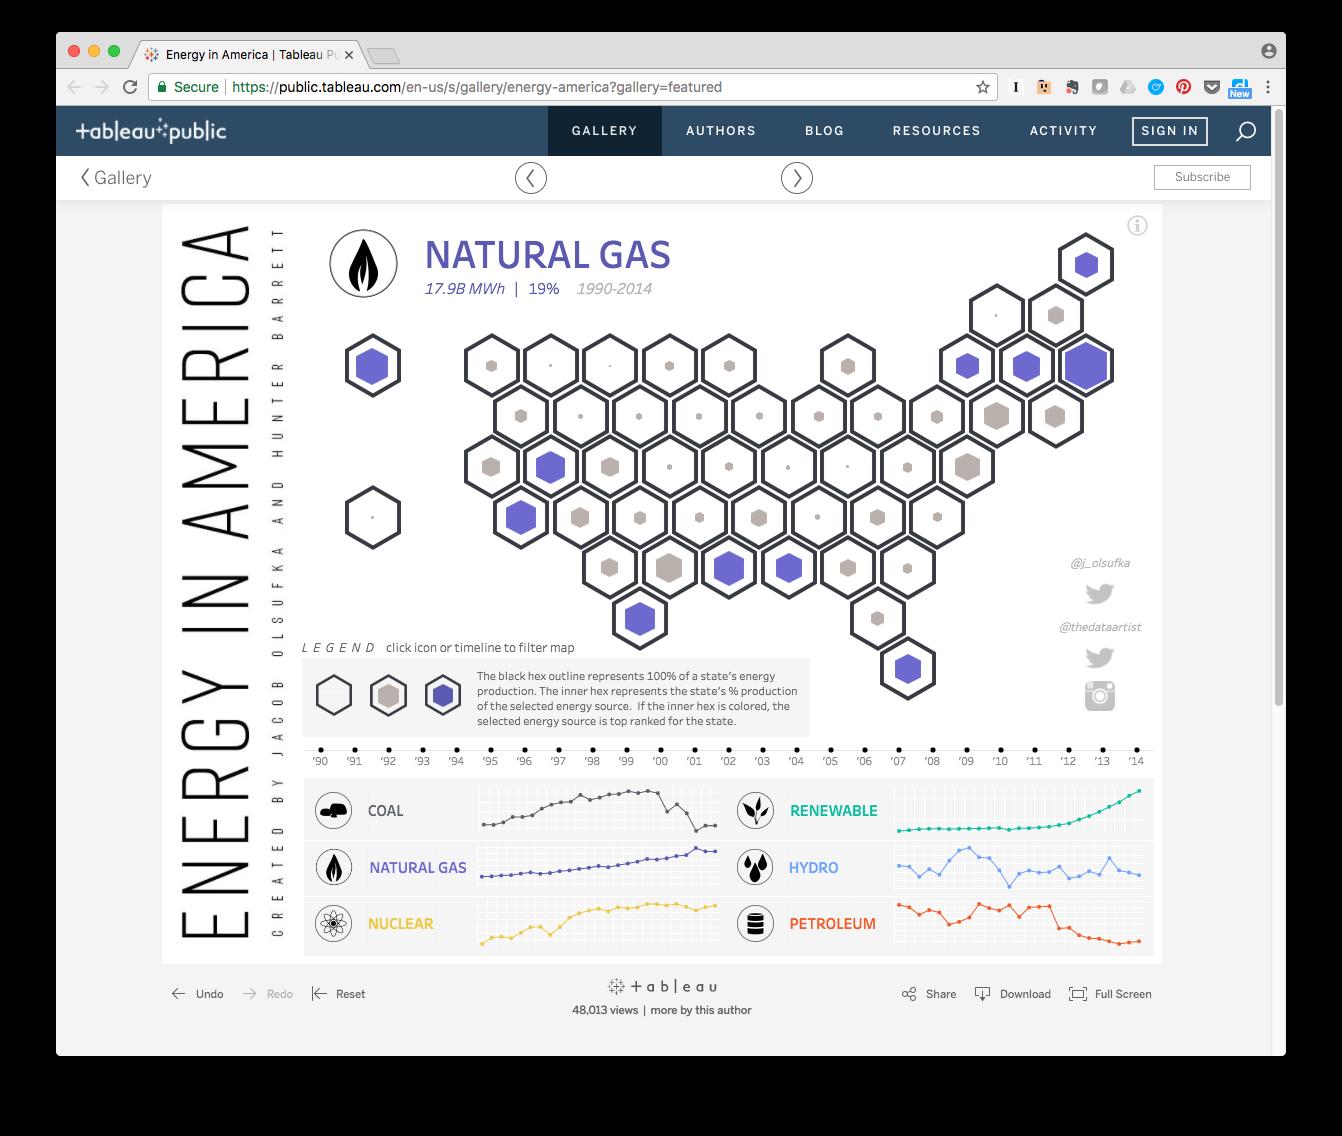 Pin by D Kalafus on Data Visualizations | Data visualization, Us map ...